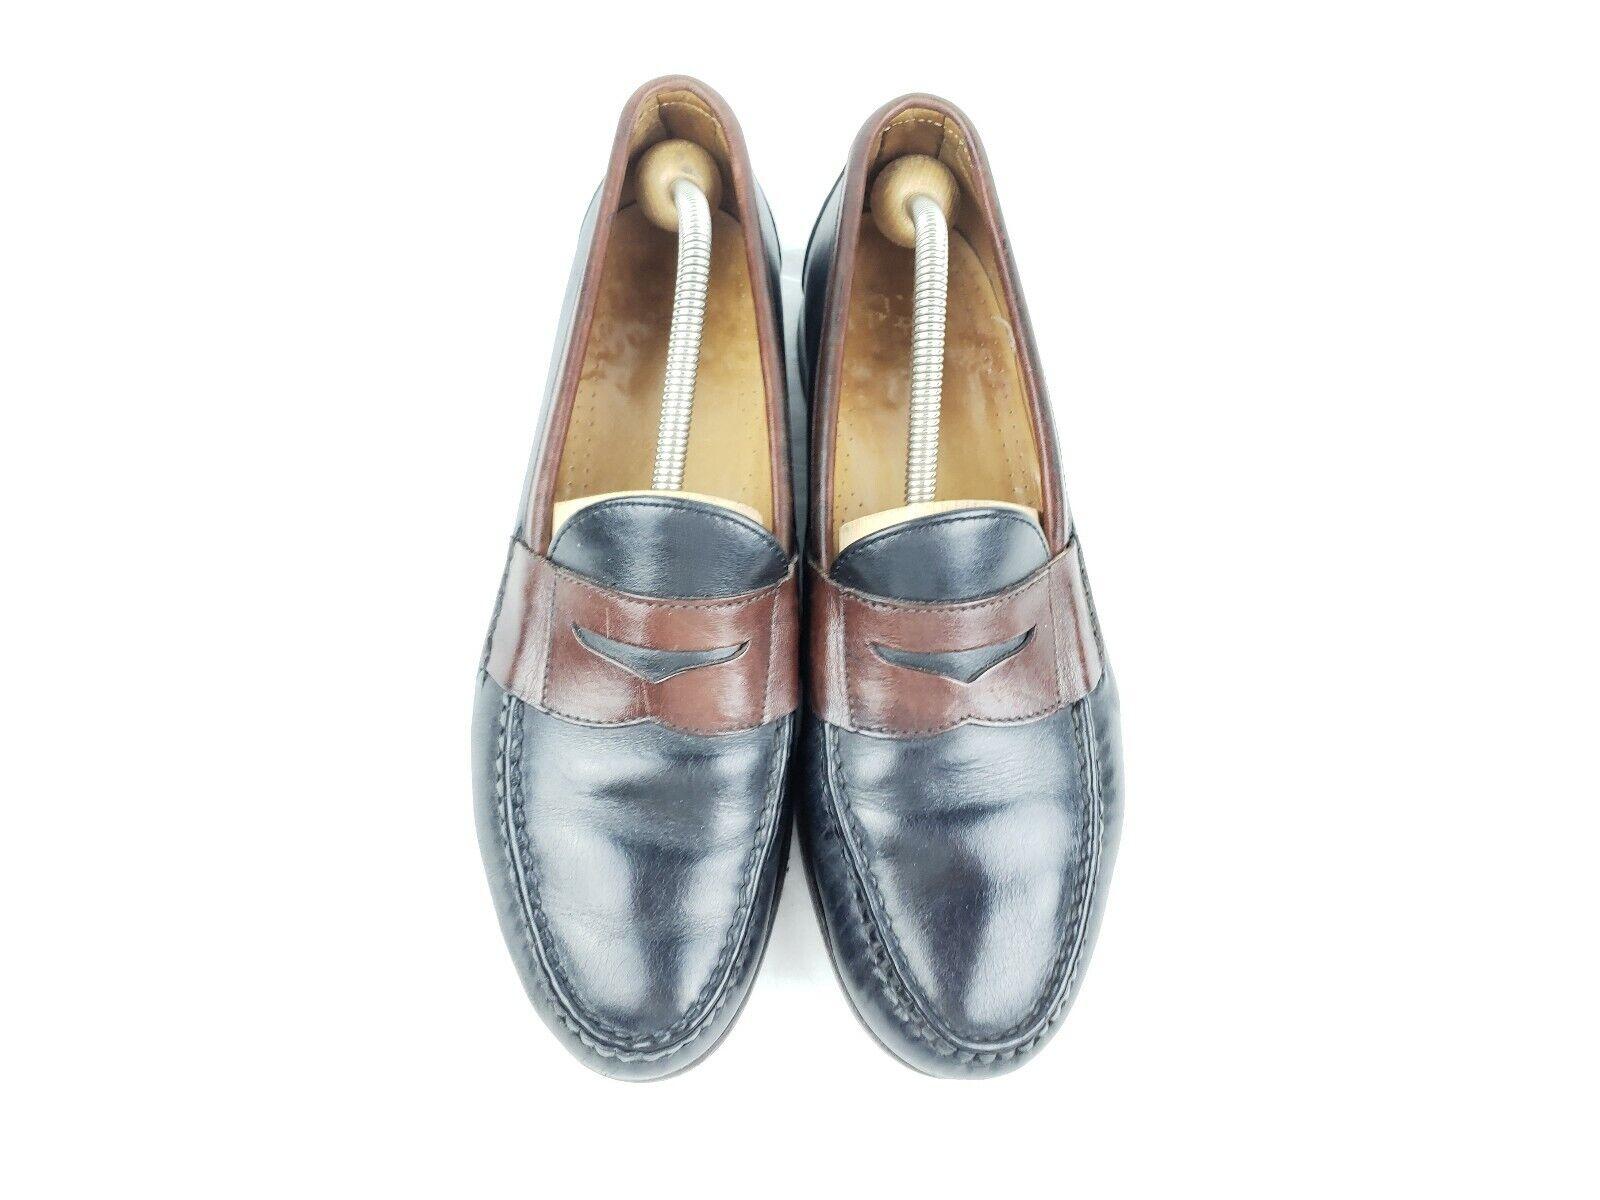 ALLEN EDMONDS BRANDON men's black brown leather new shoes penny loafers  10.5 D USA